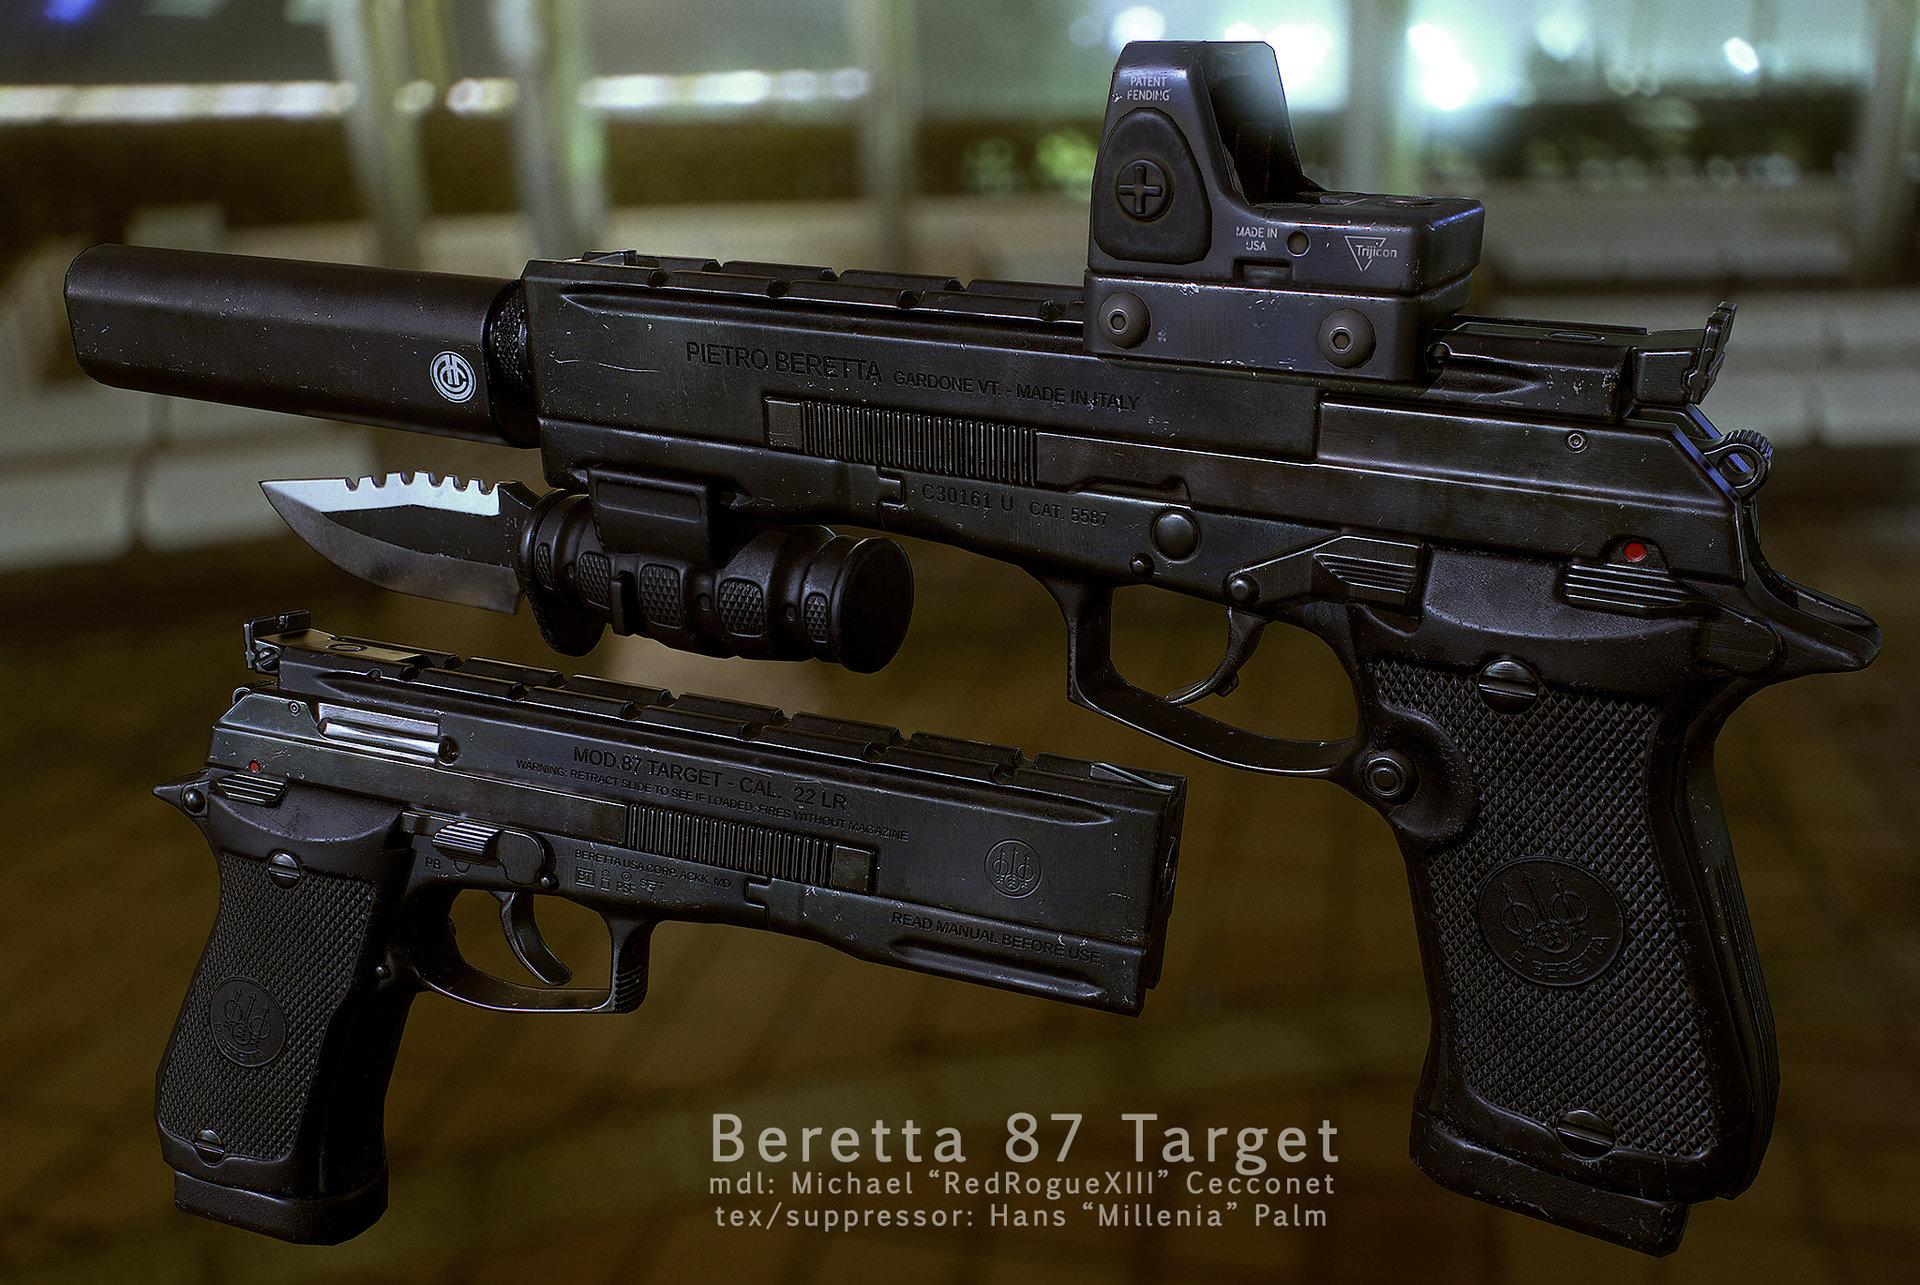 1920x1285 > Beretta 87 Target Wallpapers